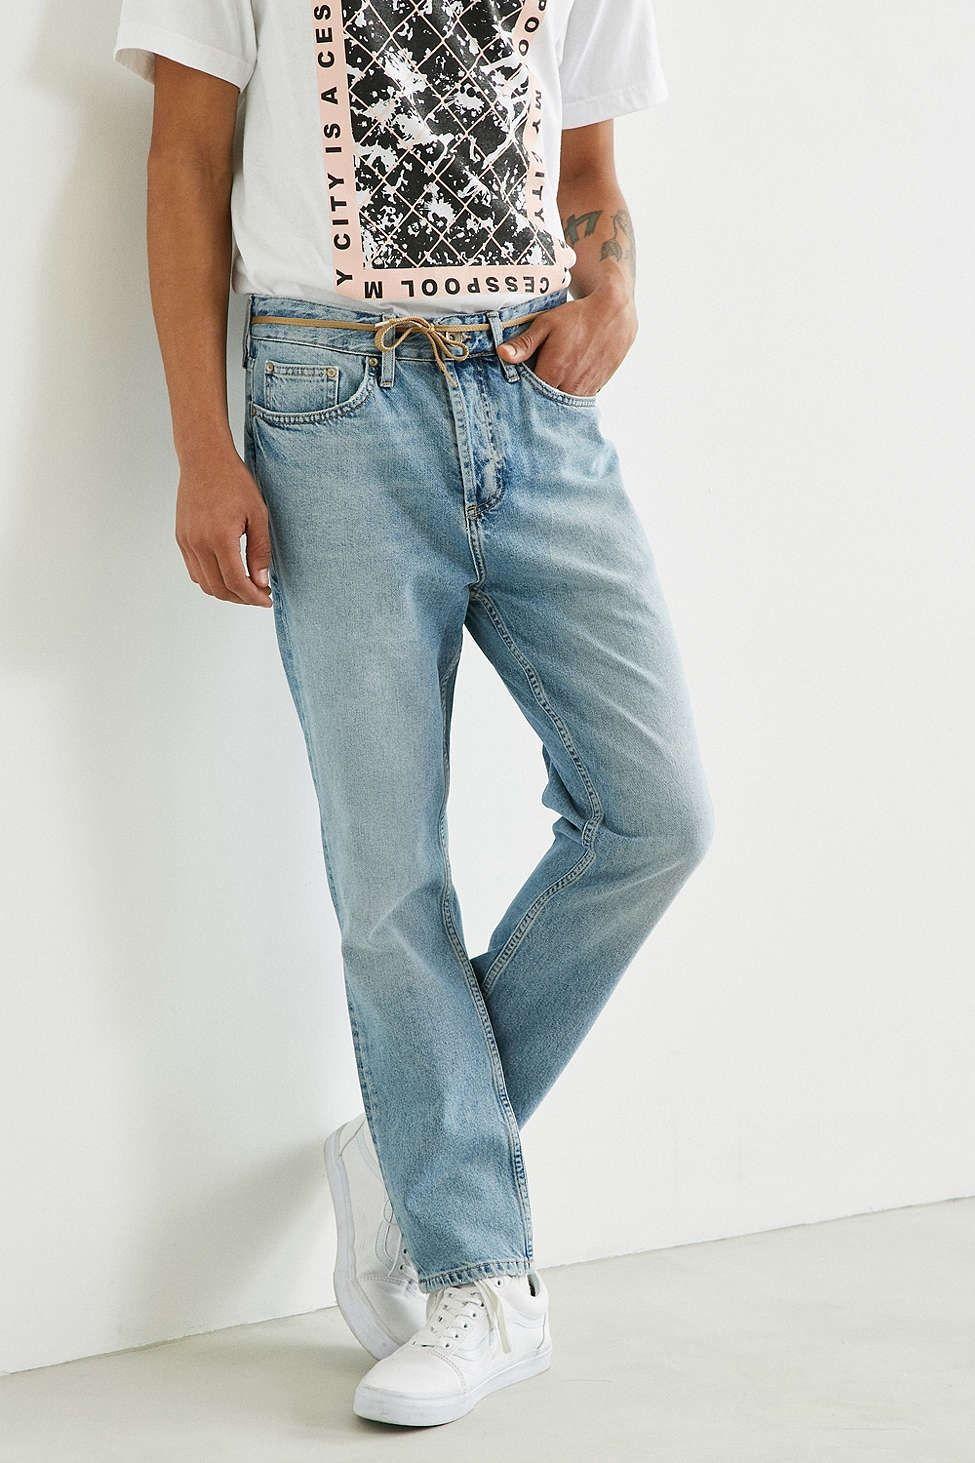 Bdg Light Stonewash Dad Jean Vintage Denim Clothes Fashion Outfits